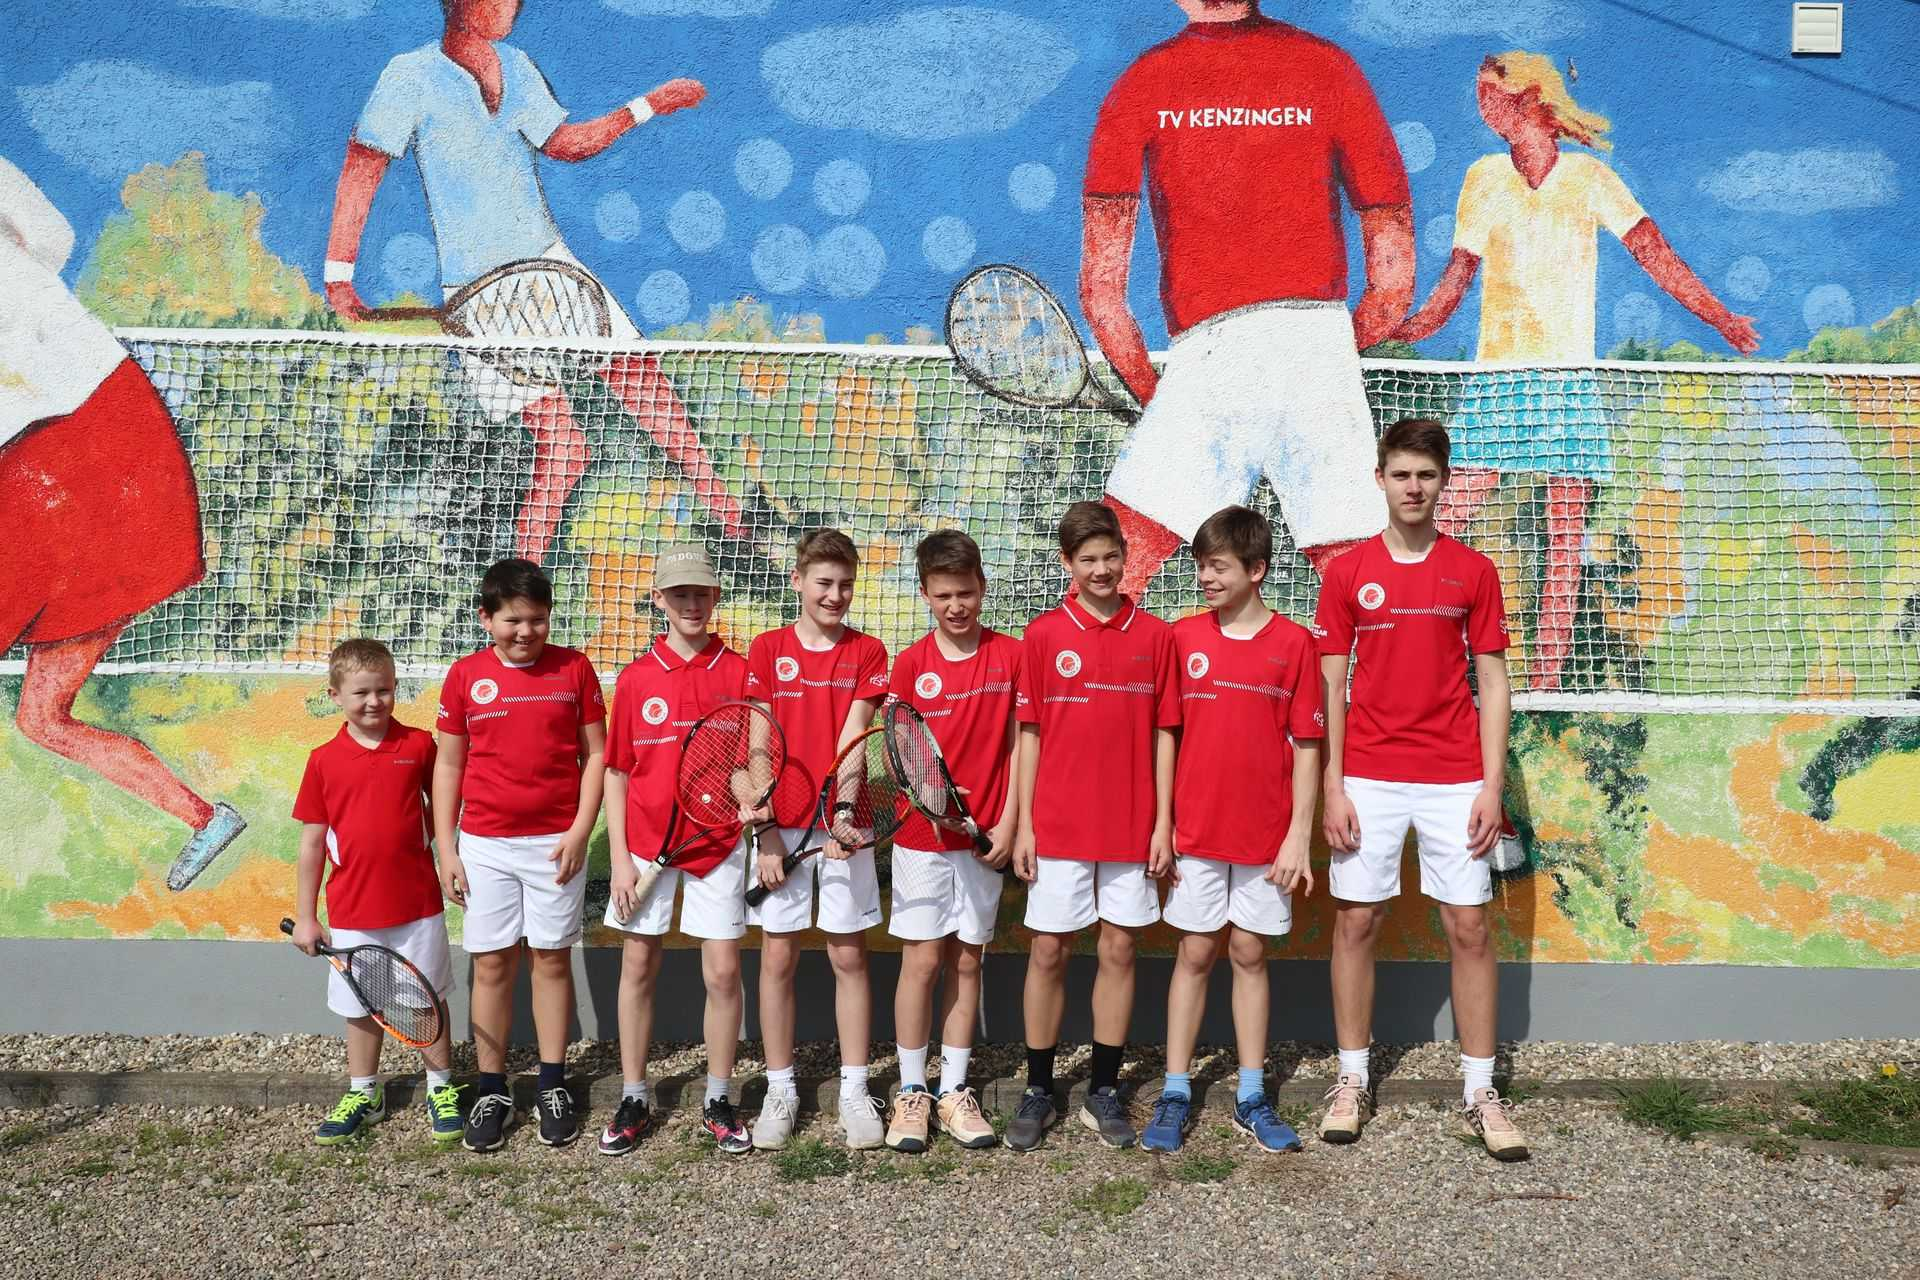 Tennisverein Kenzingen manschafte 4